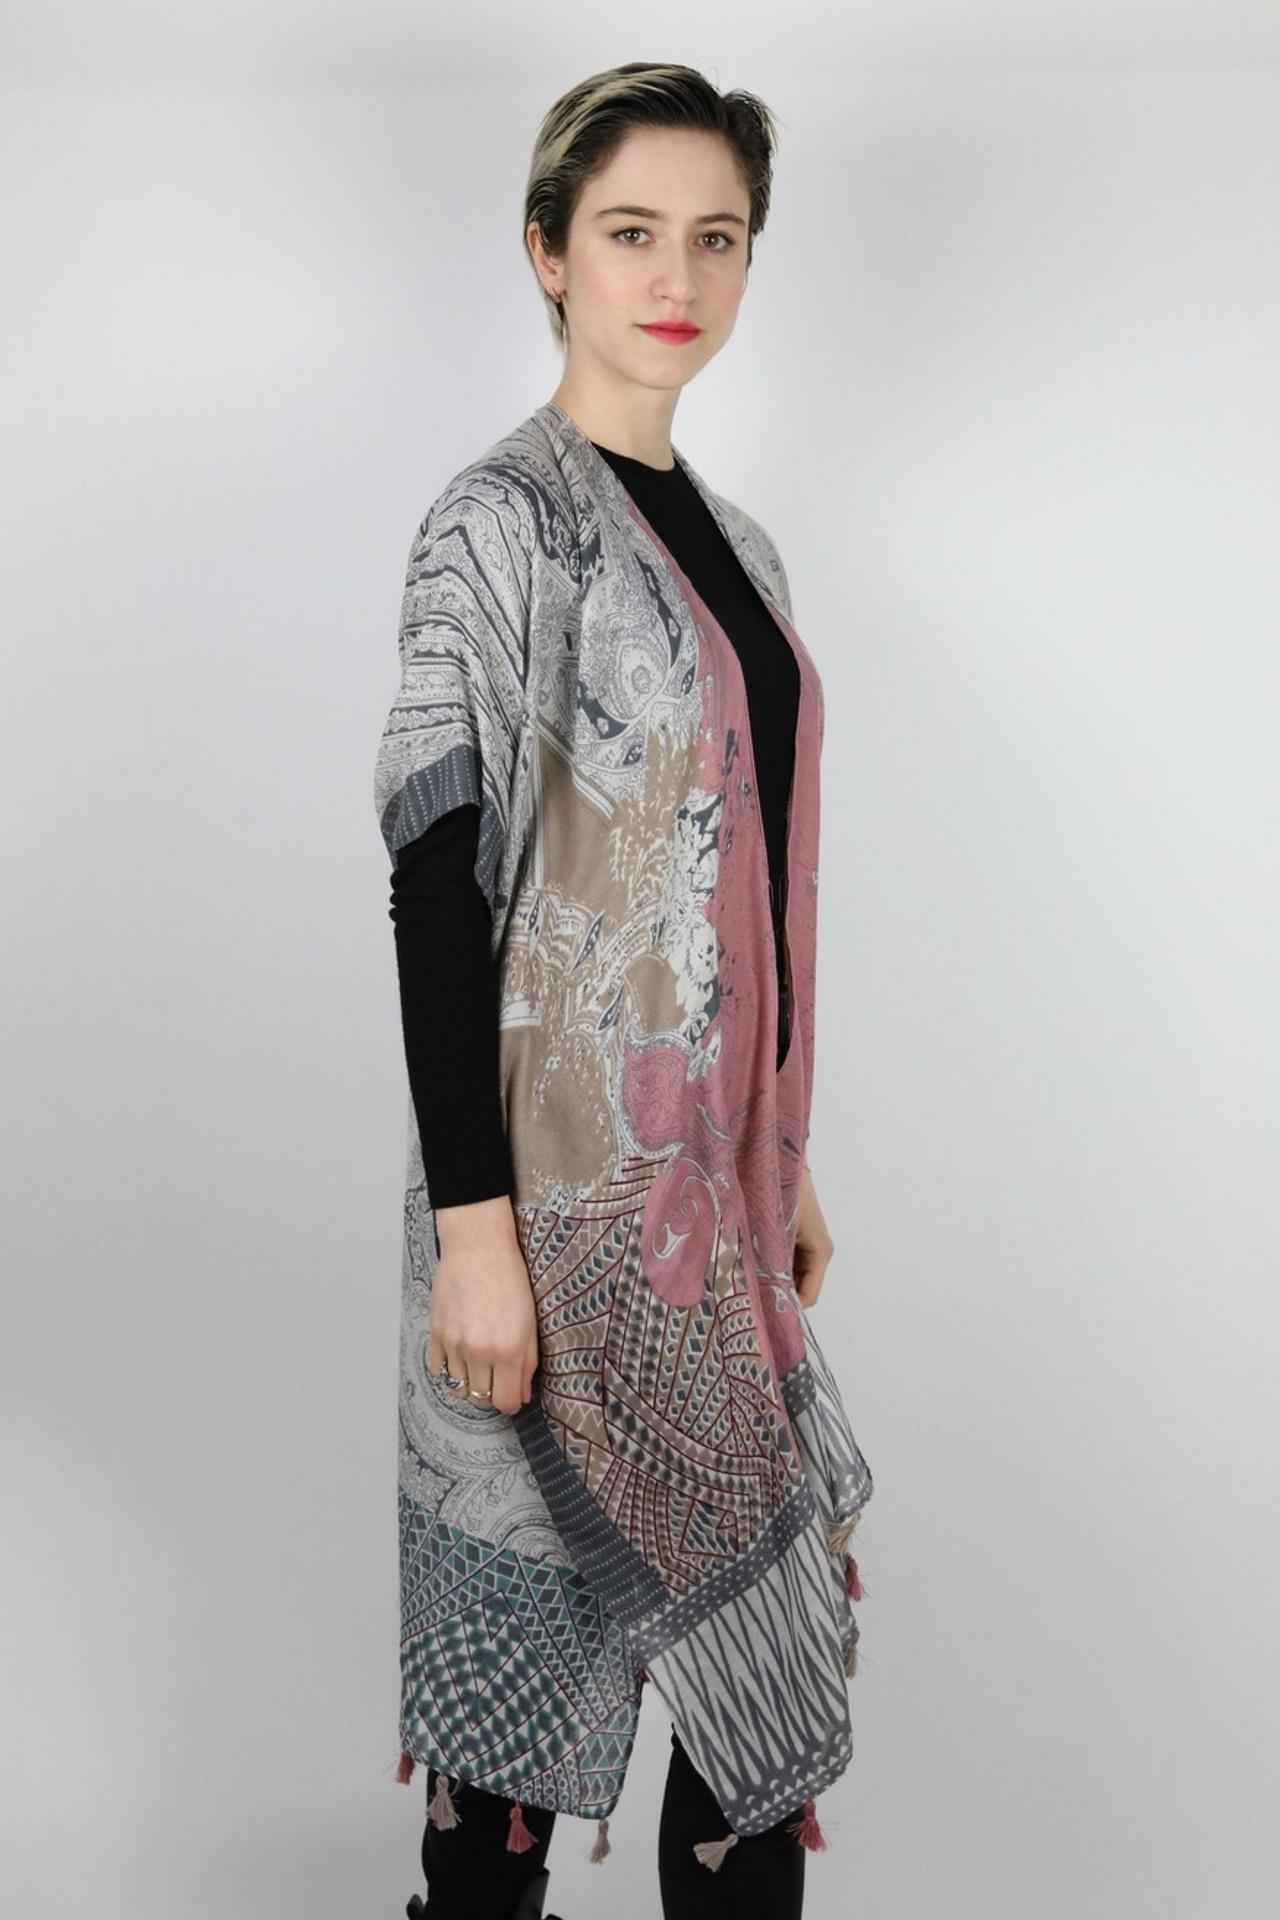 CLOTHES01 STOLA DONNA FOULARD CARDIGAN COPRISPALLE 3 1stAmerican elegante stola da donna foulard cardigan coprispalle